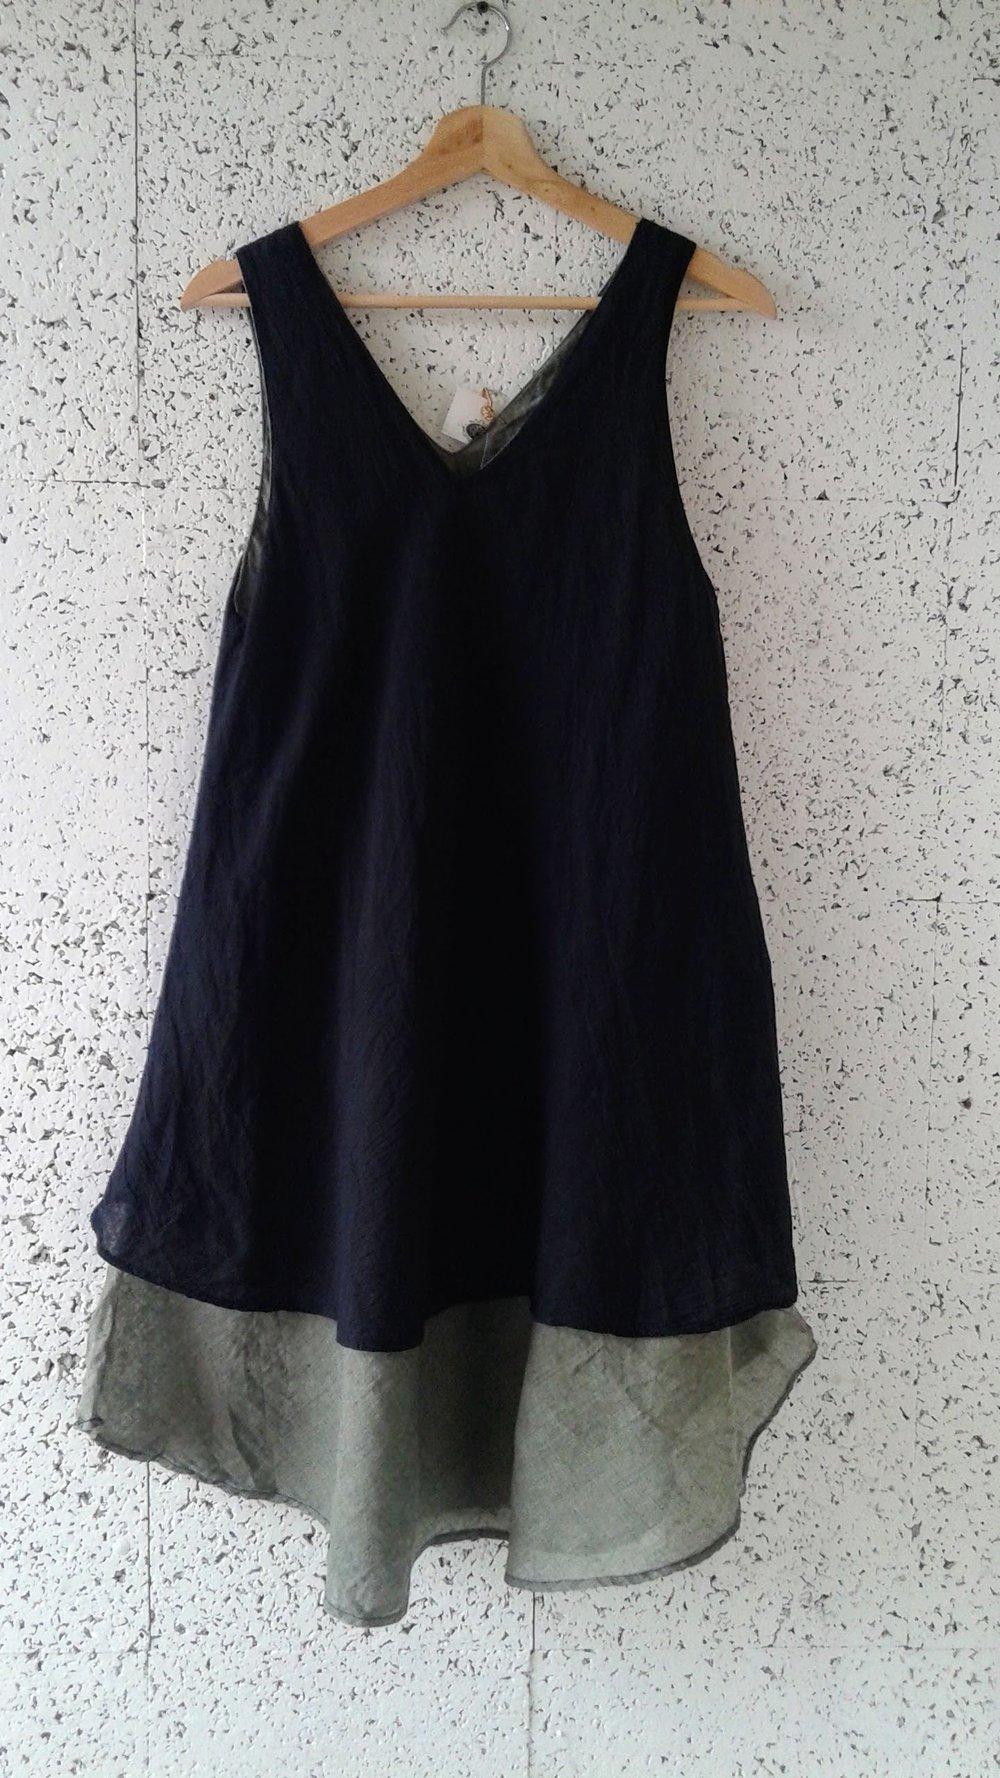 Linen dress (NWT); Size M, $26